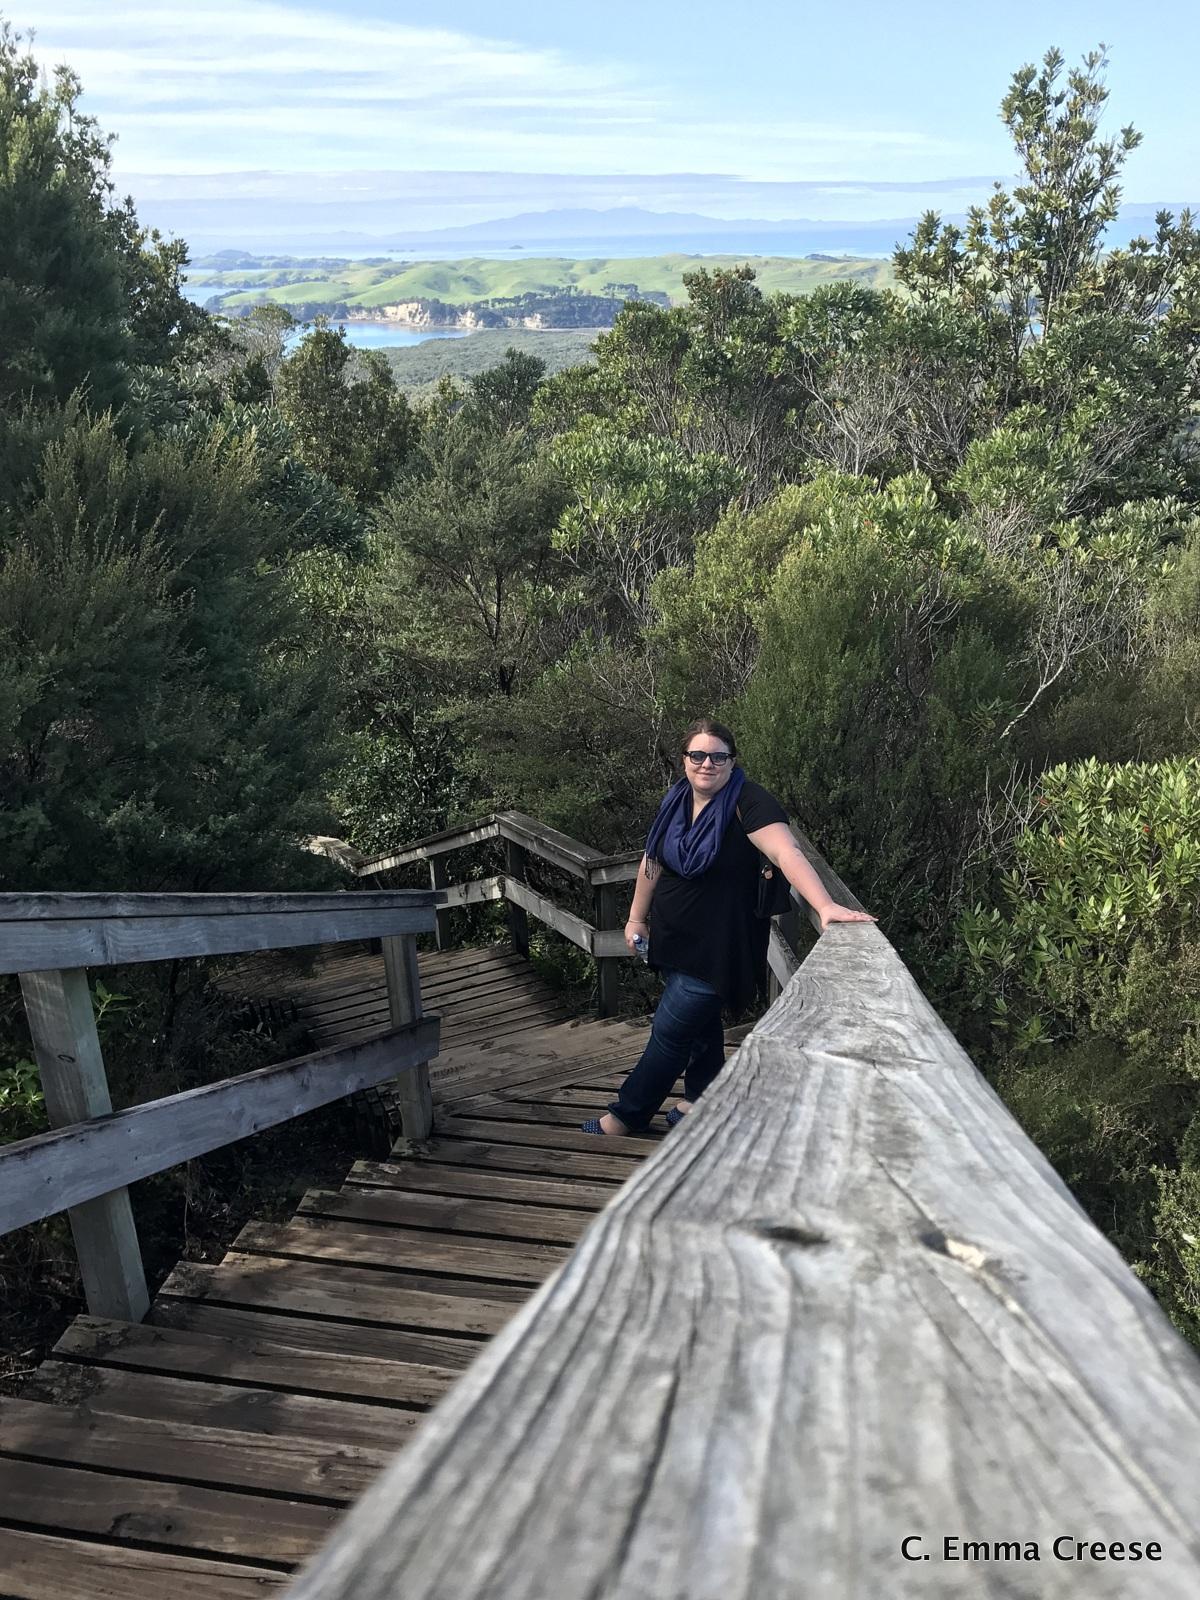 Rangitoto Island Auckland Day Trip New Zealand Adventures of a London Kiwi